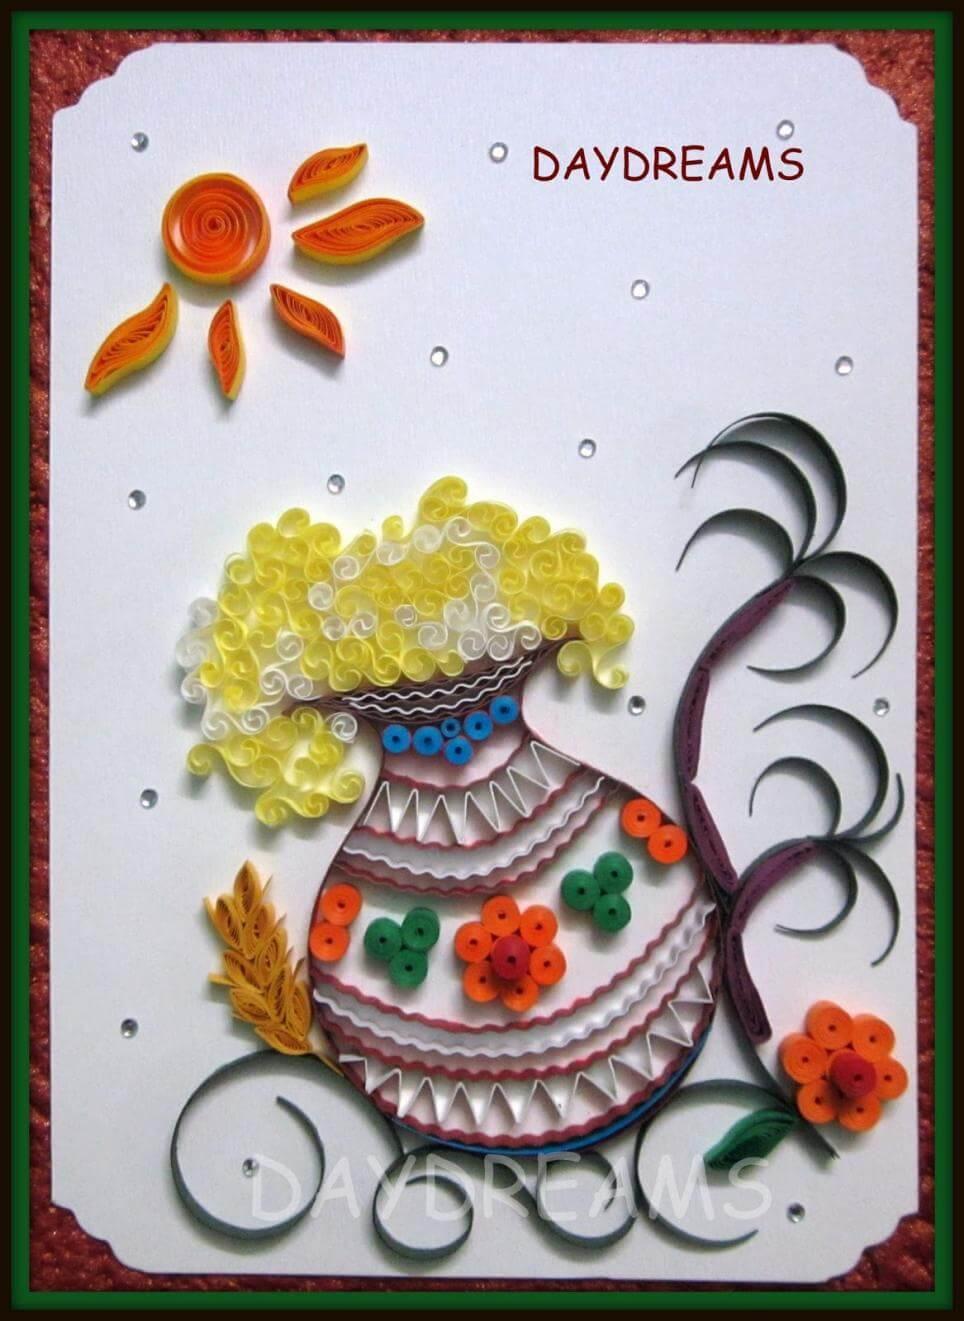 sankranti-card Creative Craft Ideas for Makar Sankranti / Pongal